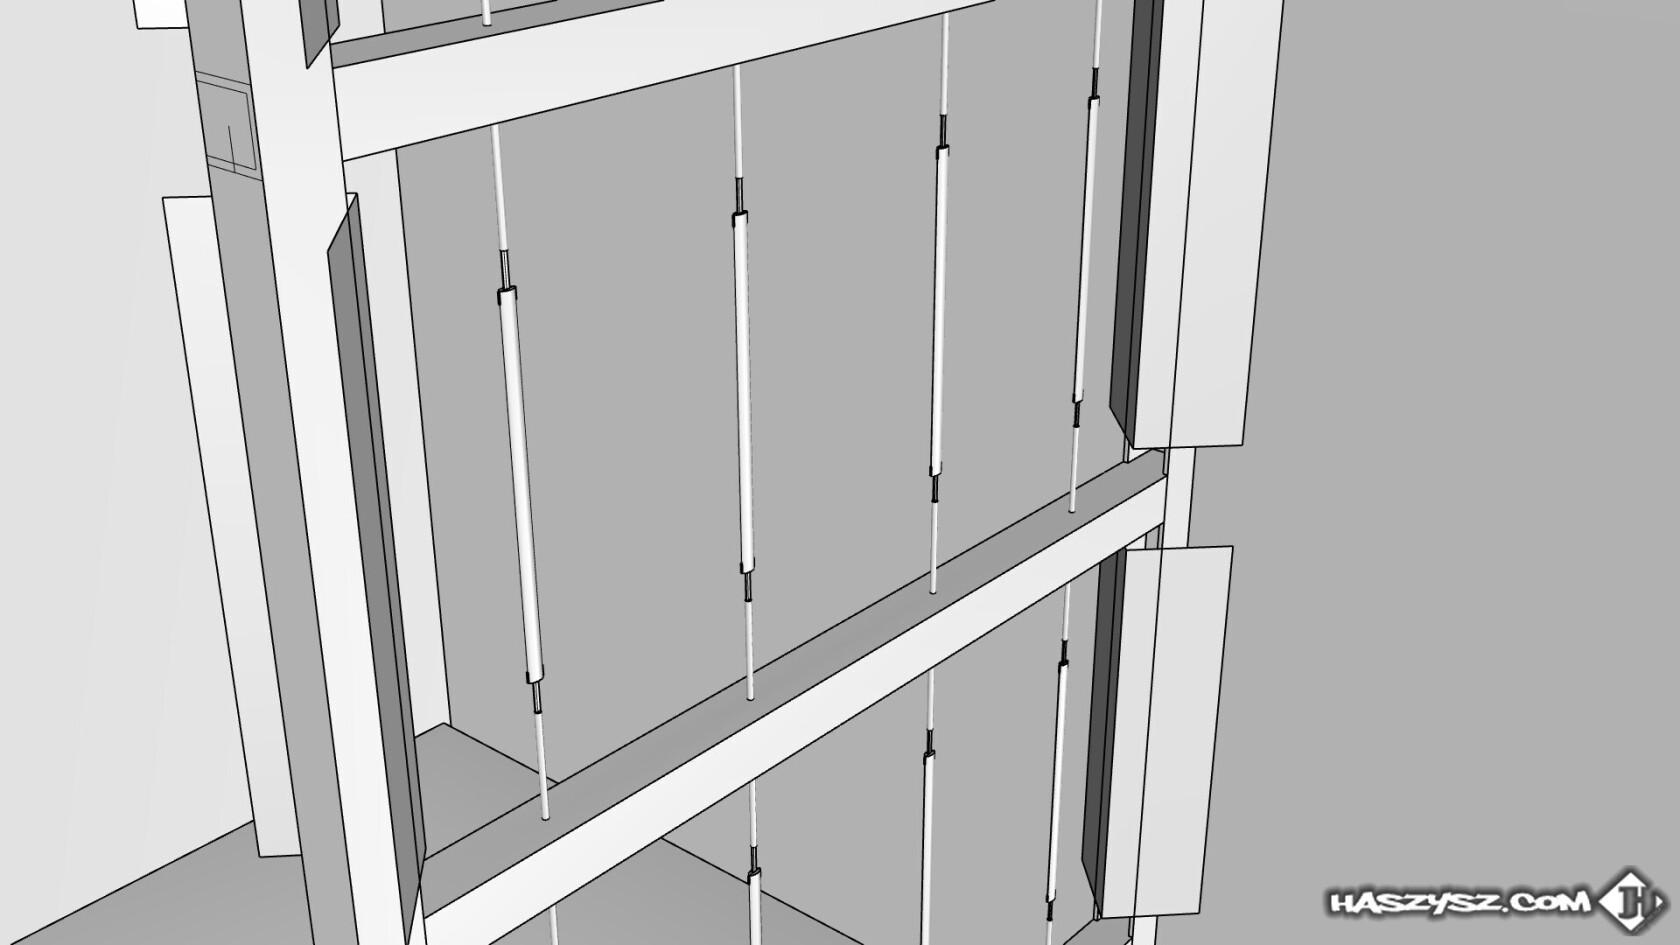 KANLUX_IDEA-FIX_02.jpg